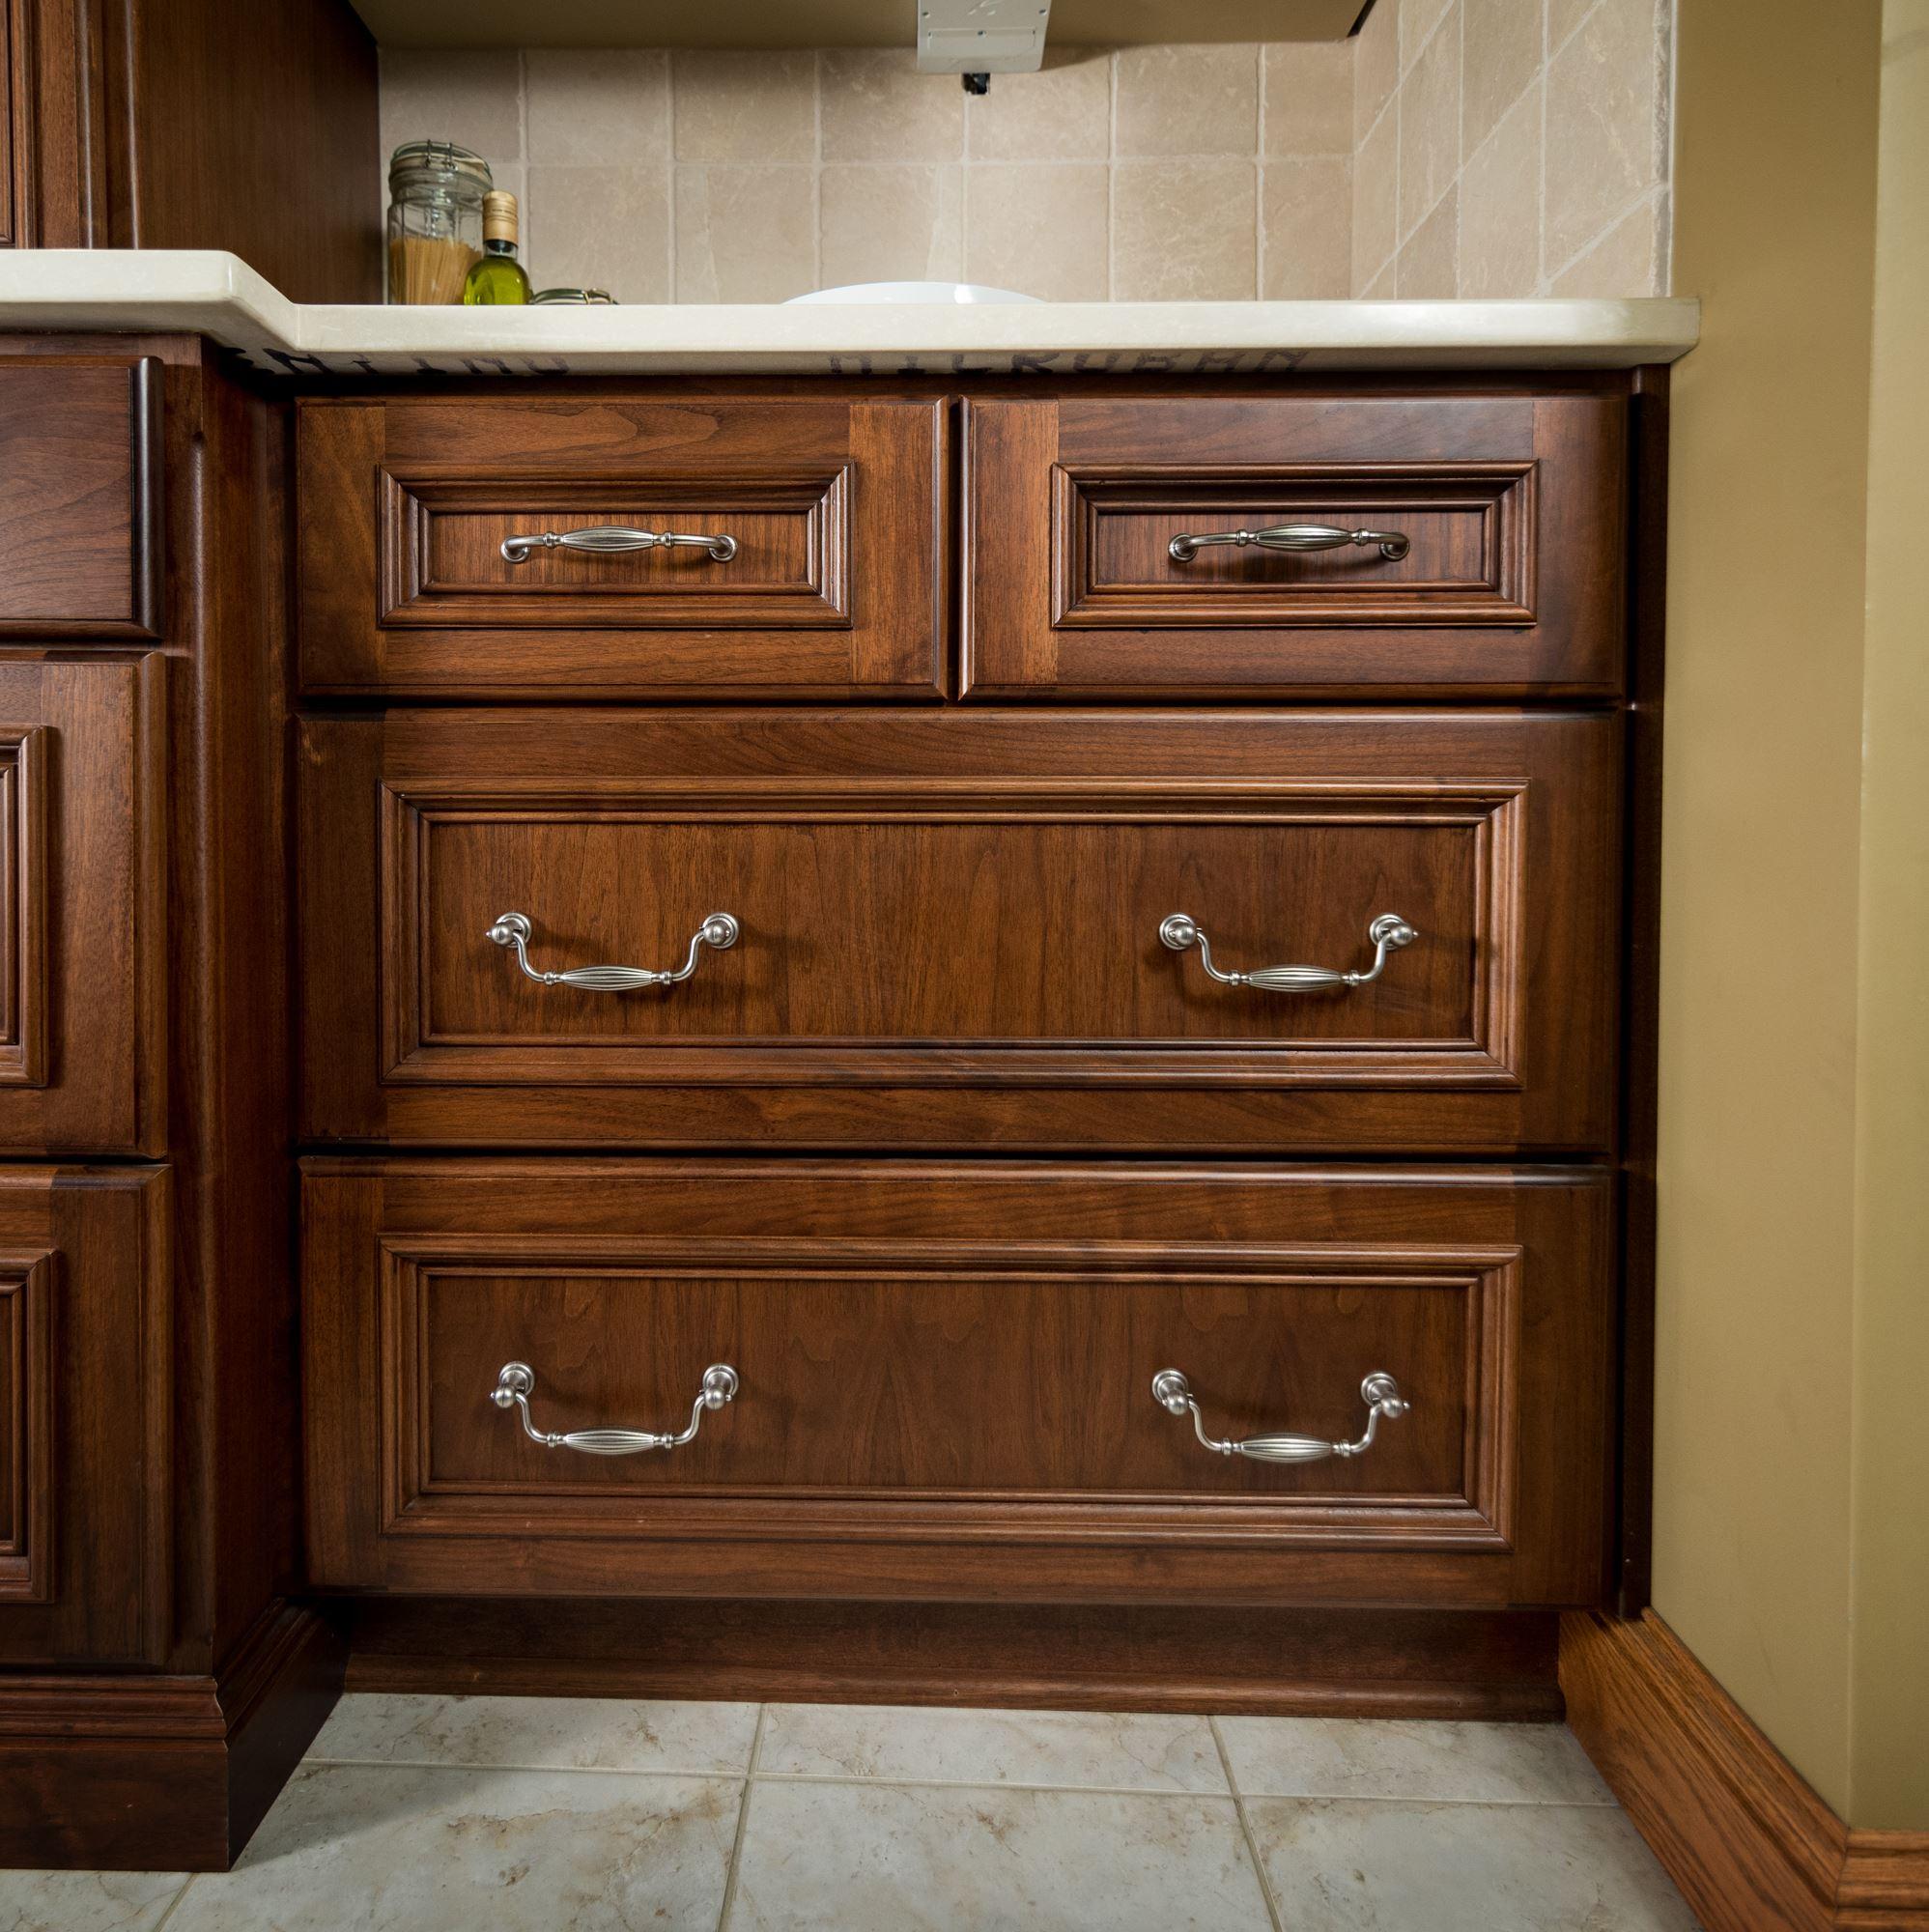 Ana White Kitchen Cabinet Sink Base Full Overlay Face Frame Diy Home Bathroom Sink Cabinets